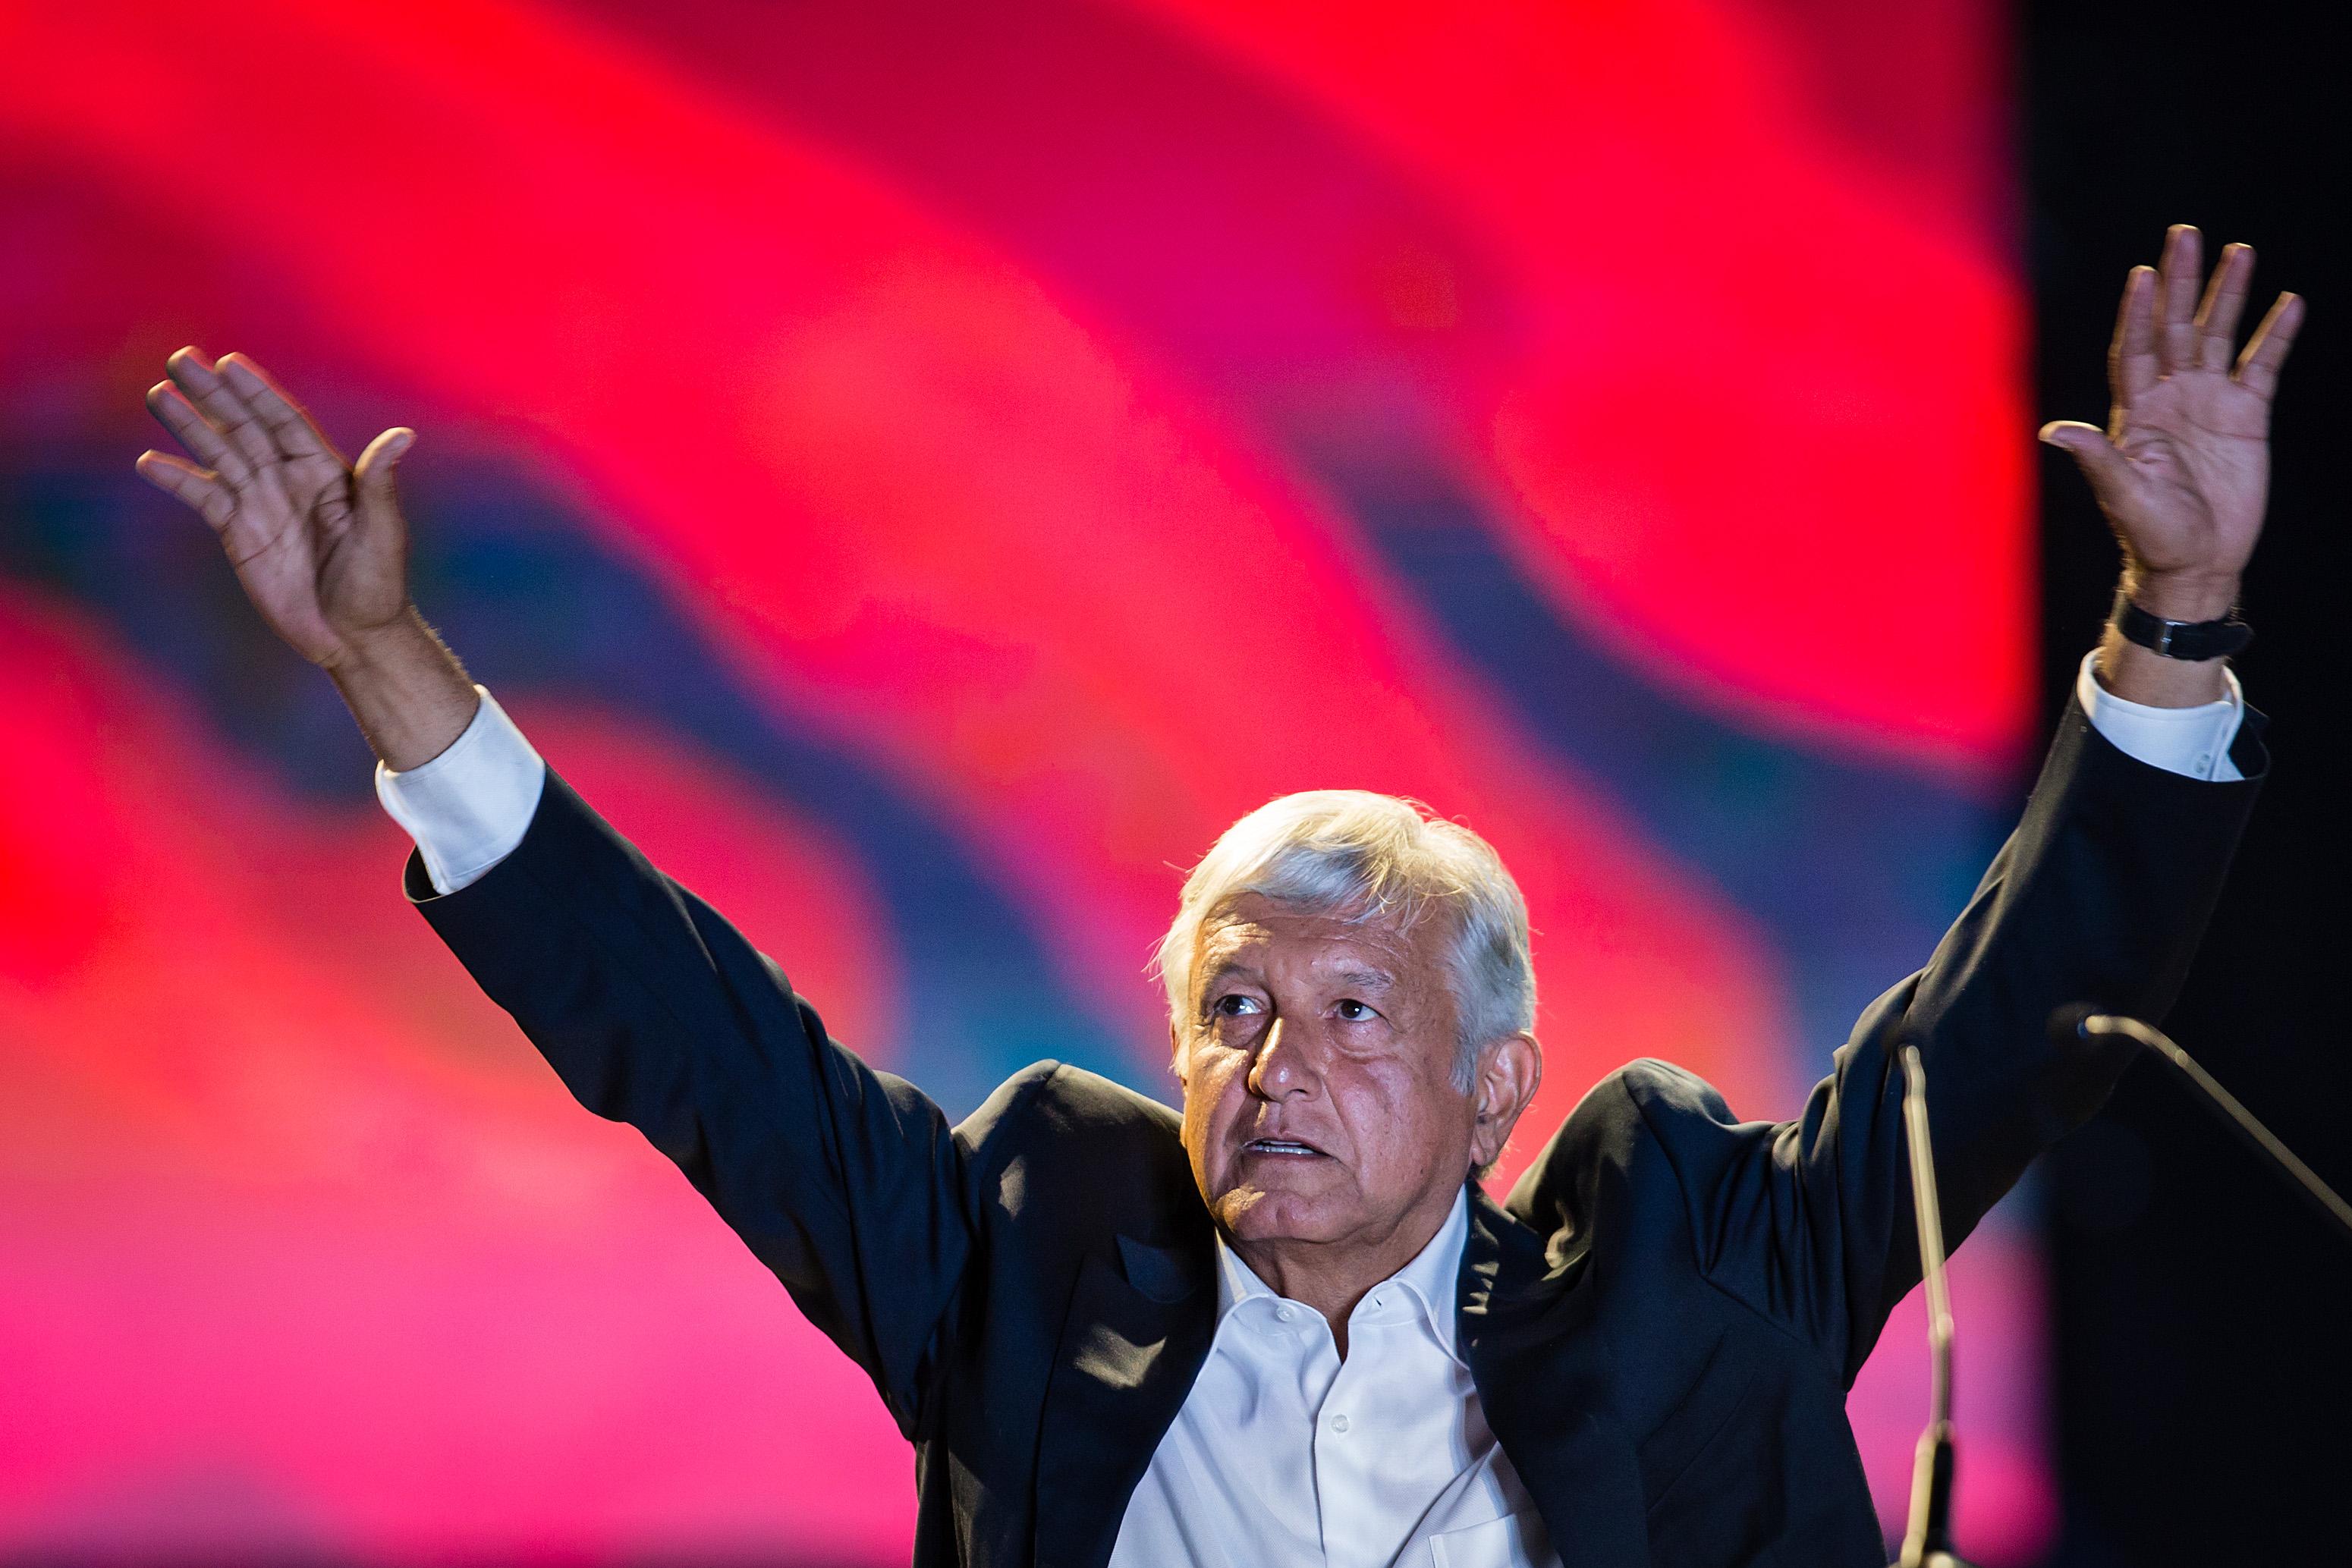 Andres Manuel Lopez Obrador Election Campaign - Closing Event